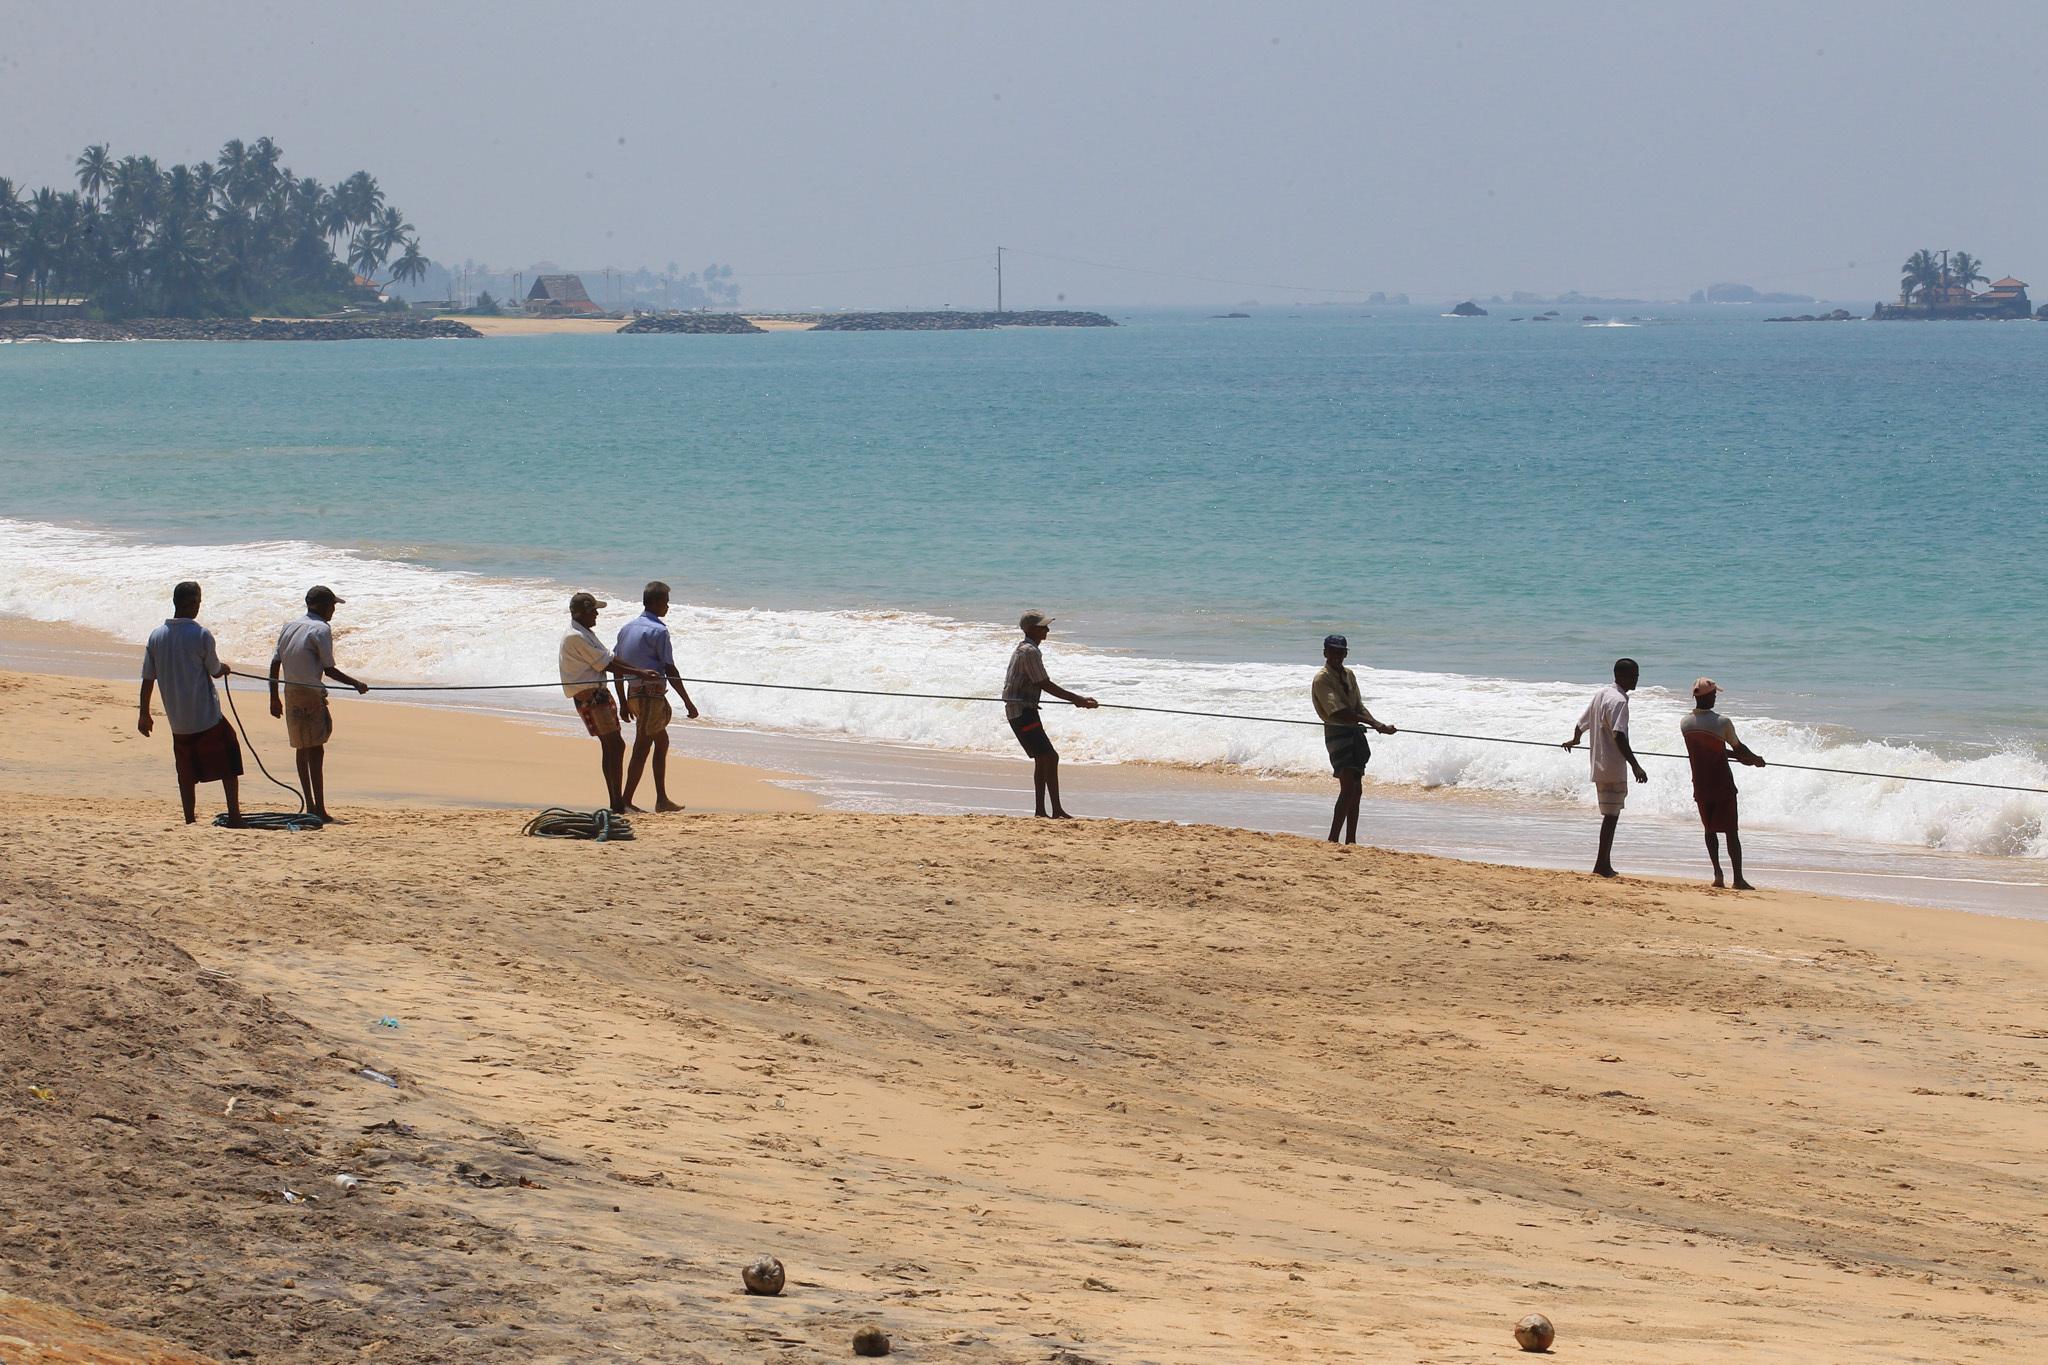 Ambalangoda is a small town in the southern coast of Sri Lanka